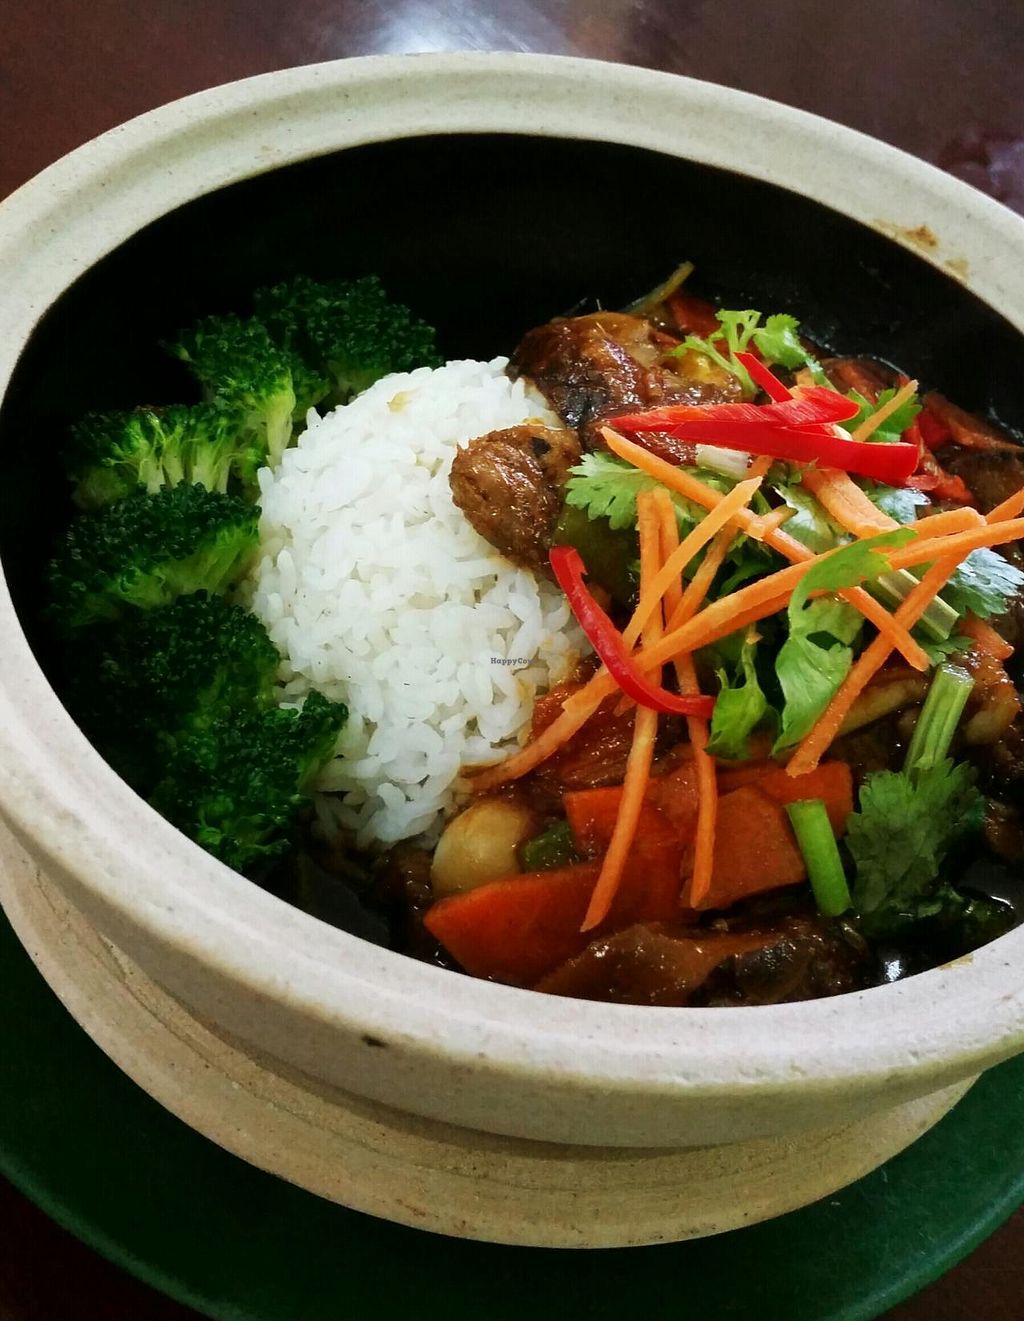 "Photo of Tian Ka Vegetarian  by <a href=""/members/profile/Tiffanymlk"">Tiffanymlk</a> <br/>Claypot rice  <br/> June 13, 2015  - <a href='/contact/abuse/image/37019/105792'>Report</a>"